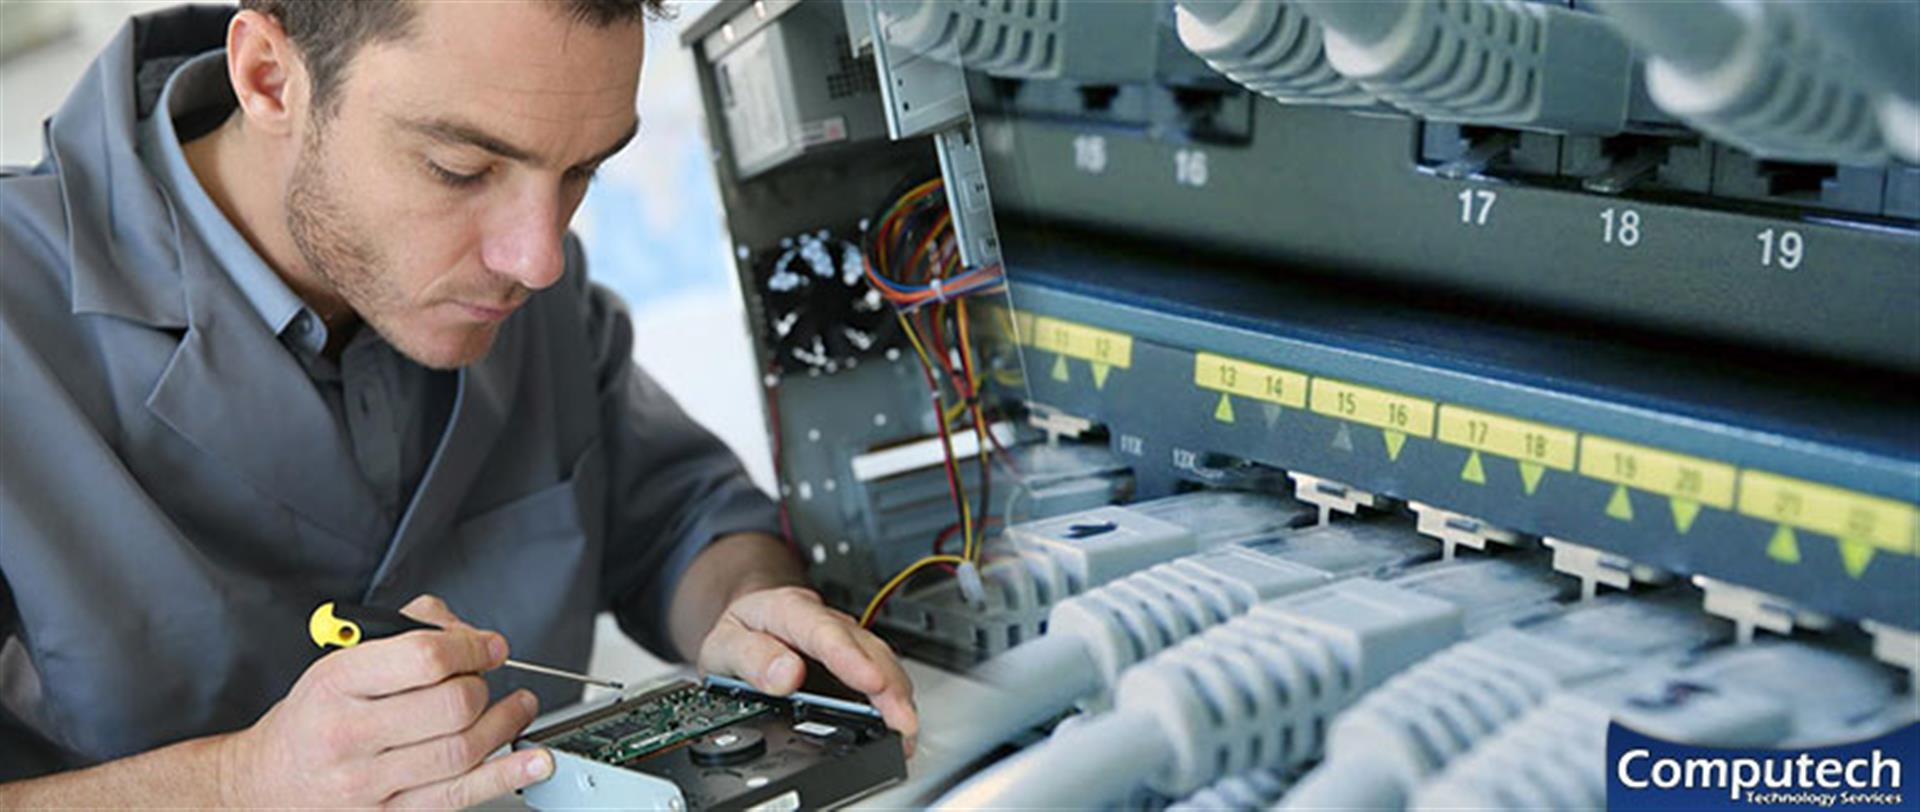 Alma Georgia On Site PC & Printer Repairs, Network, Voice & Data Cabling Contractors